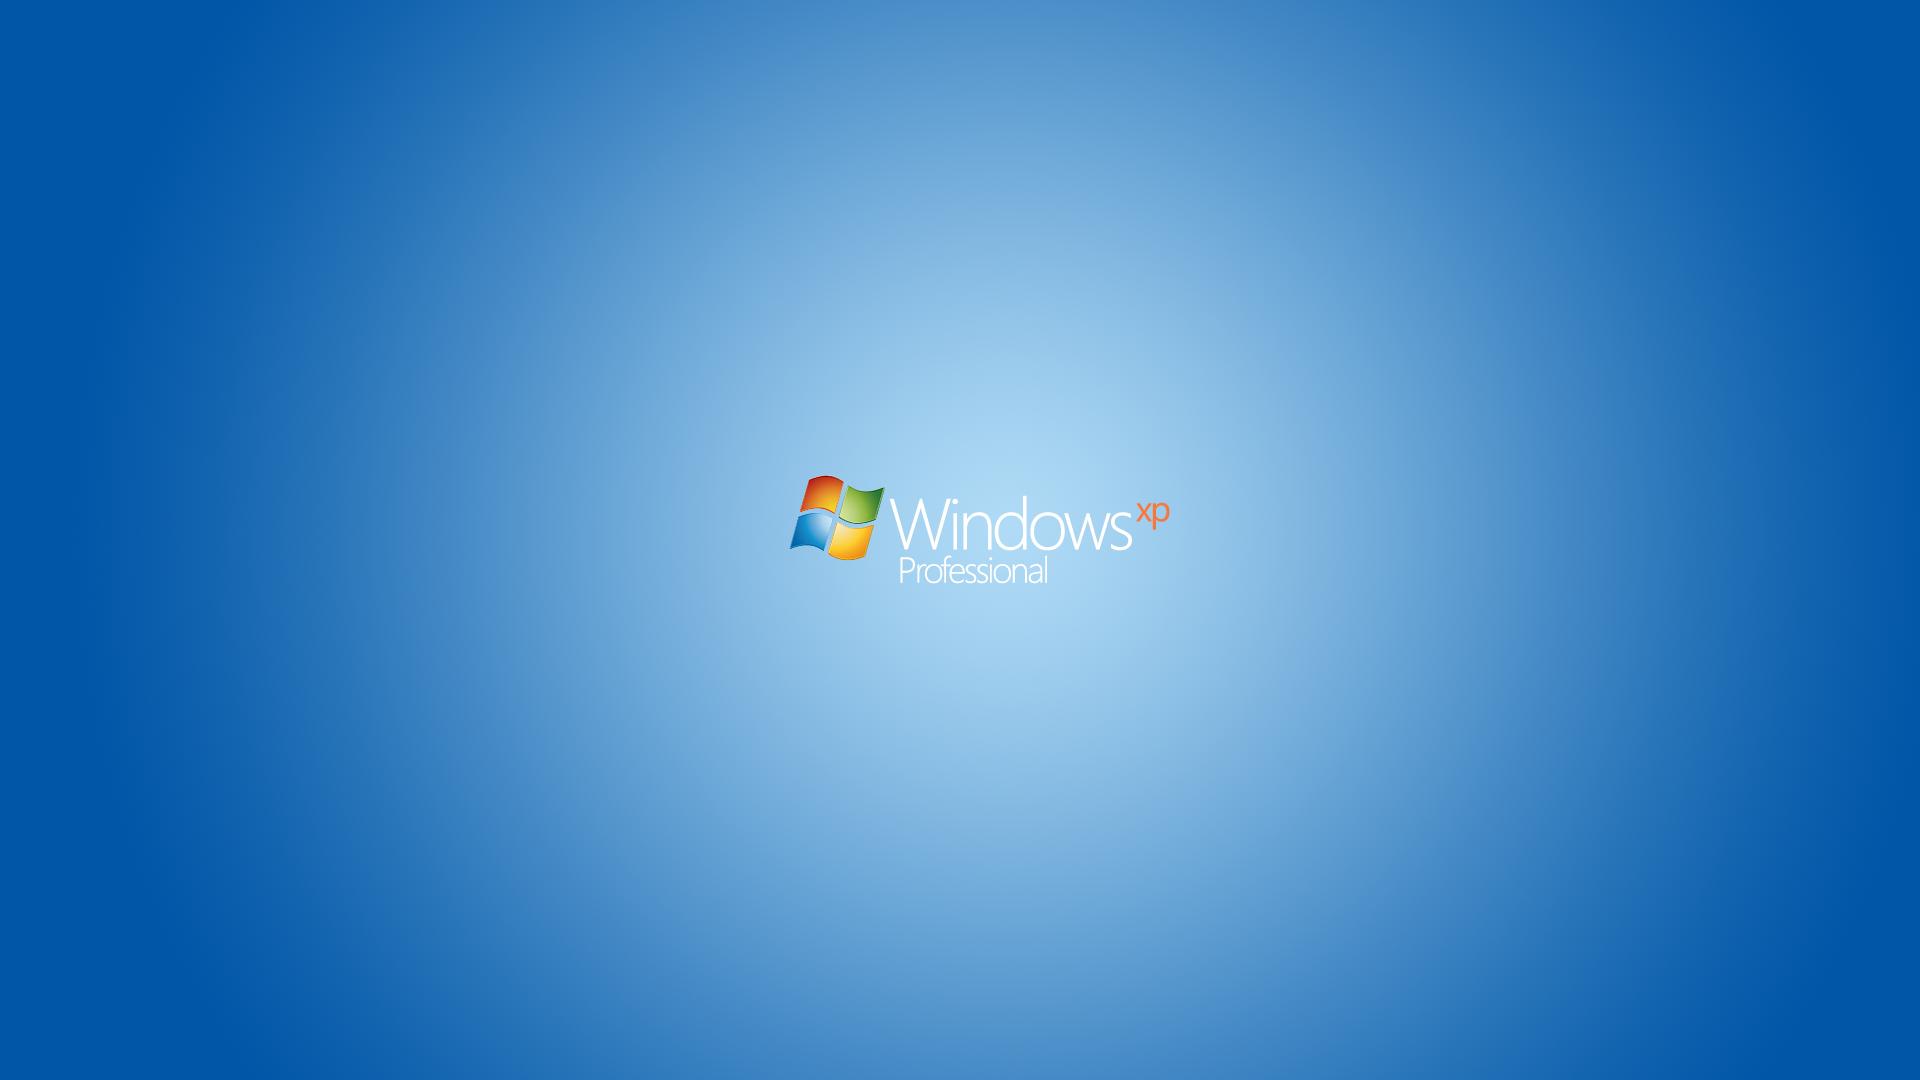 Free Windows Xp Wallpapers Wallpaper 4k Windows Xp Most Beautiful Wallpaper Wallpaper Free Download